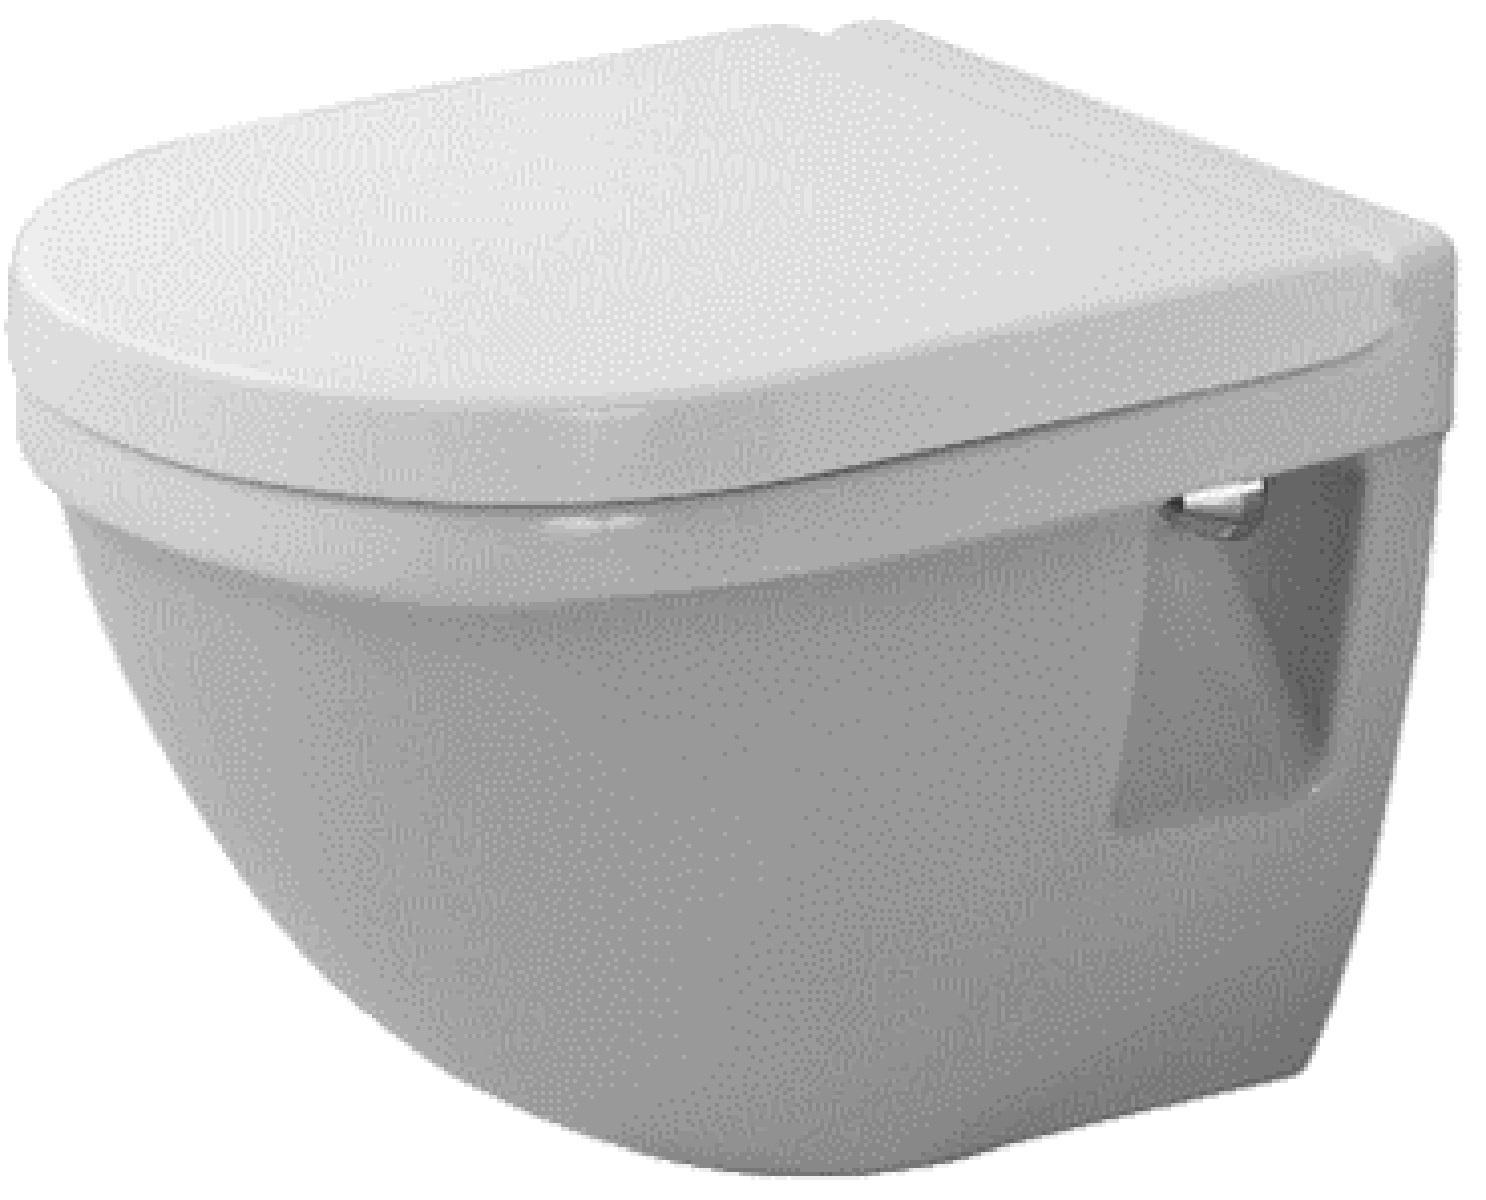 duravit starck 3 compact v ggh ngd toalett 360 x 485 mm i vitt. Black Bedroom Furniture Sets. Home Design Ideas